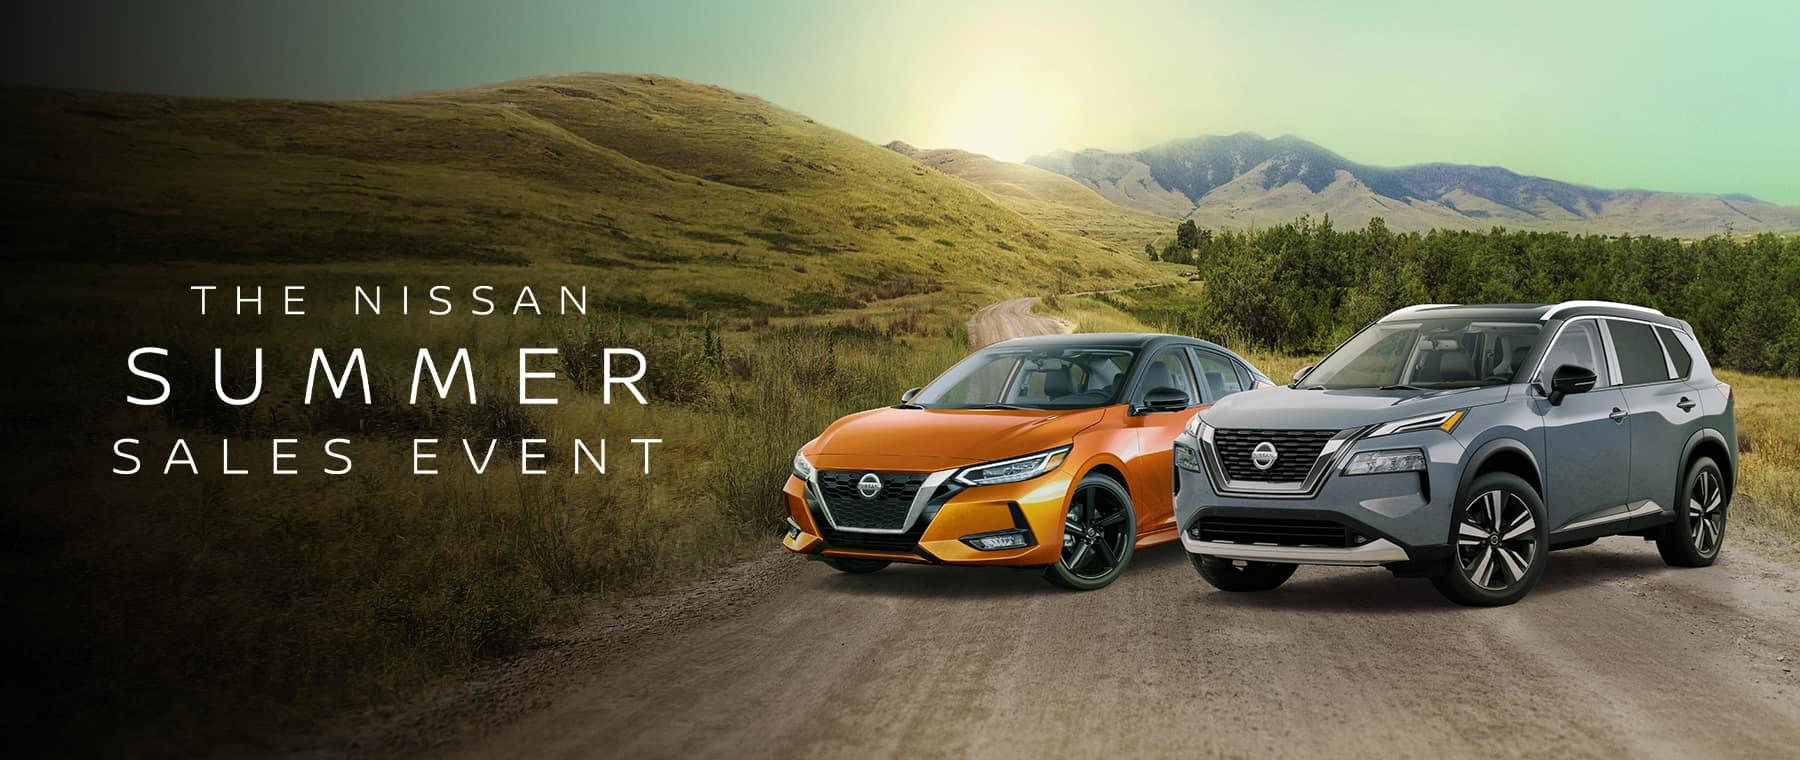 Nissan_1800x760